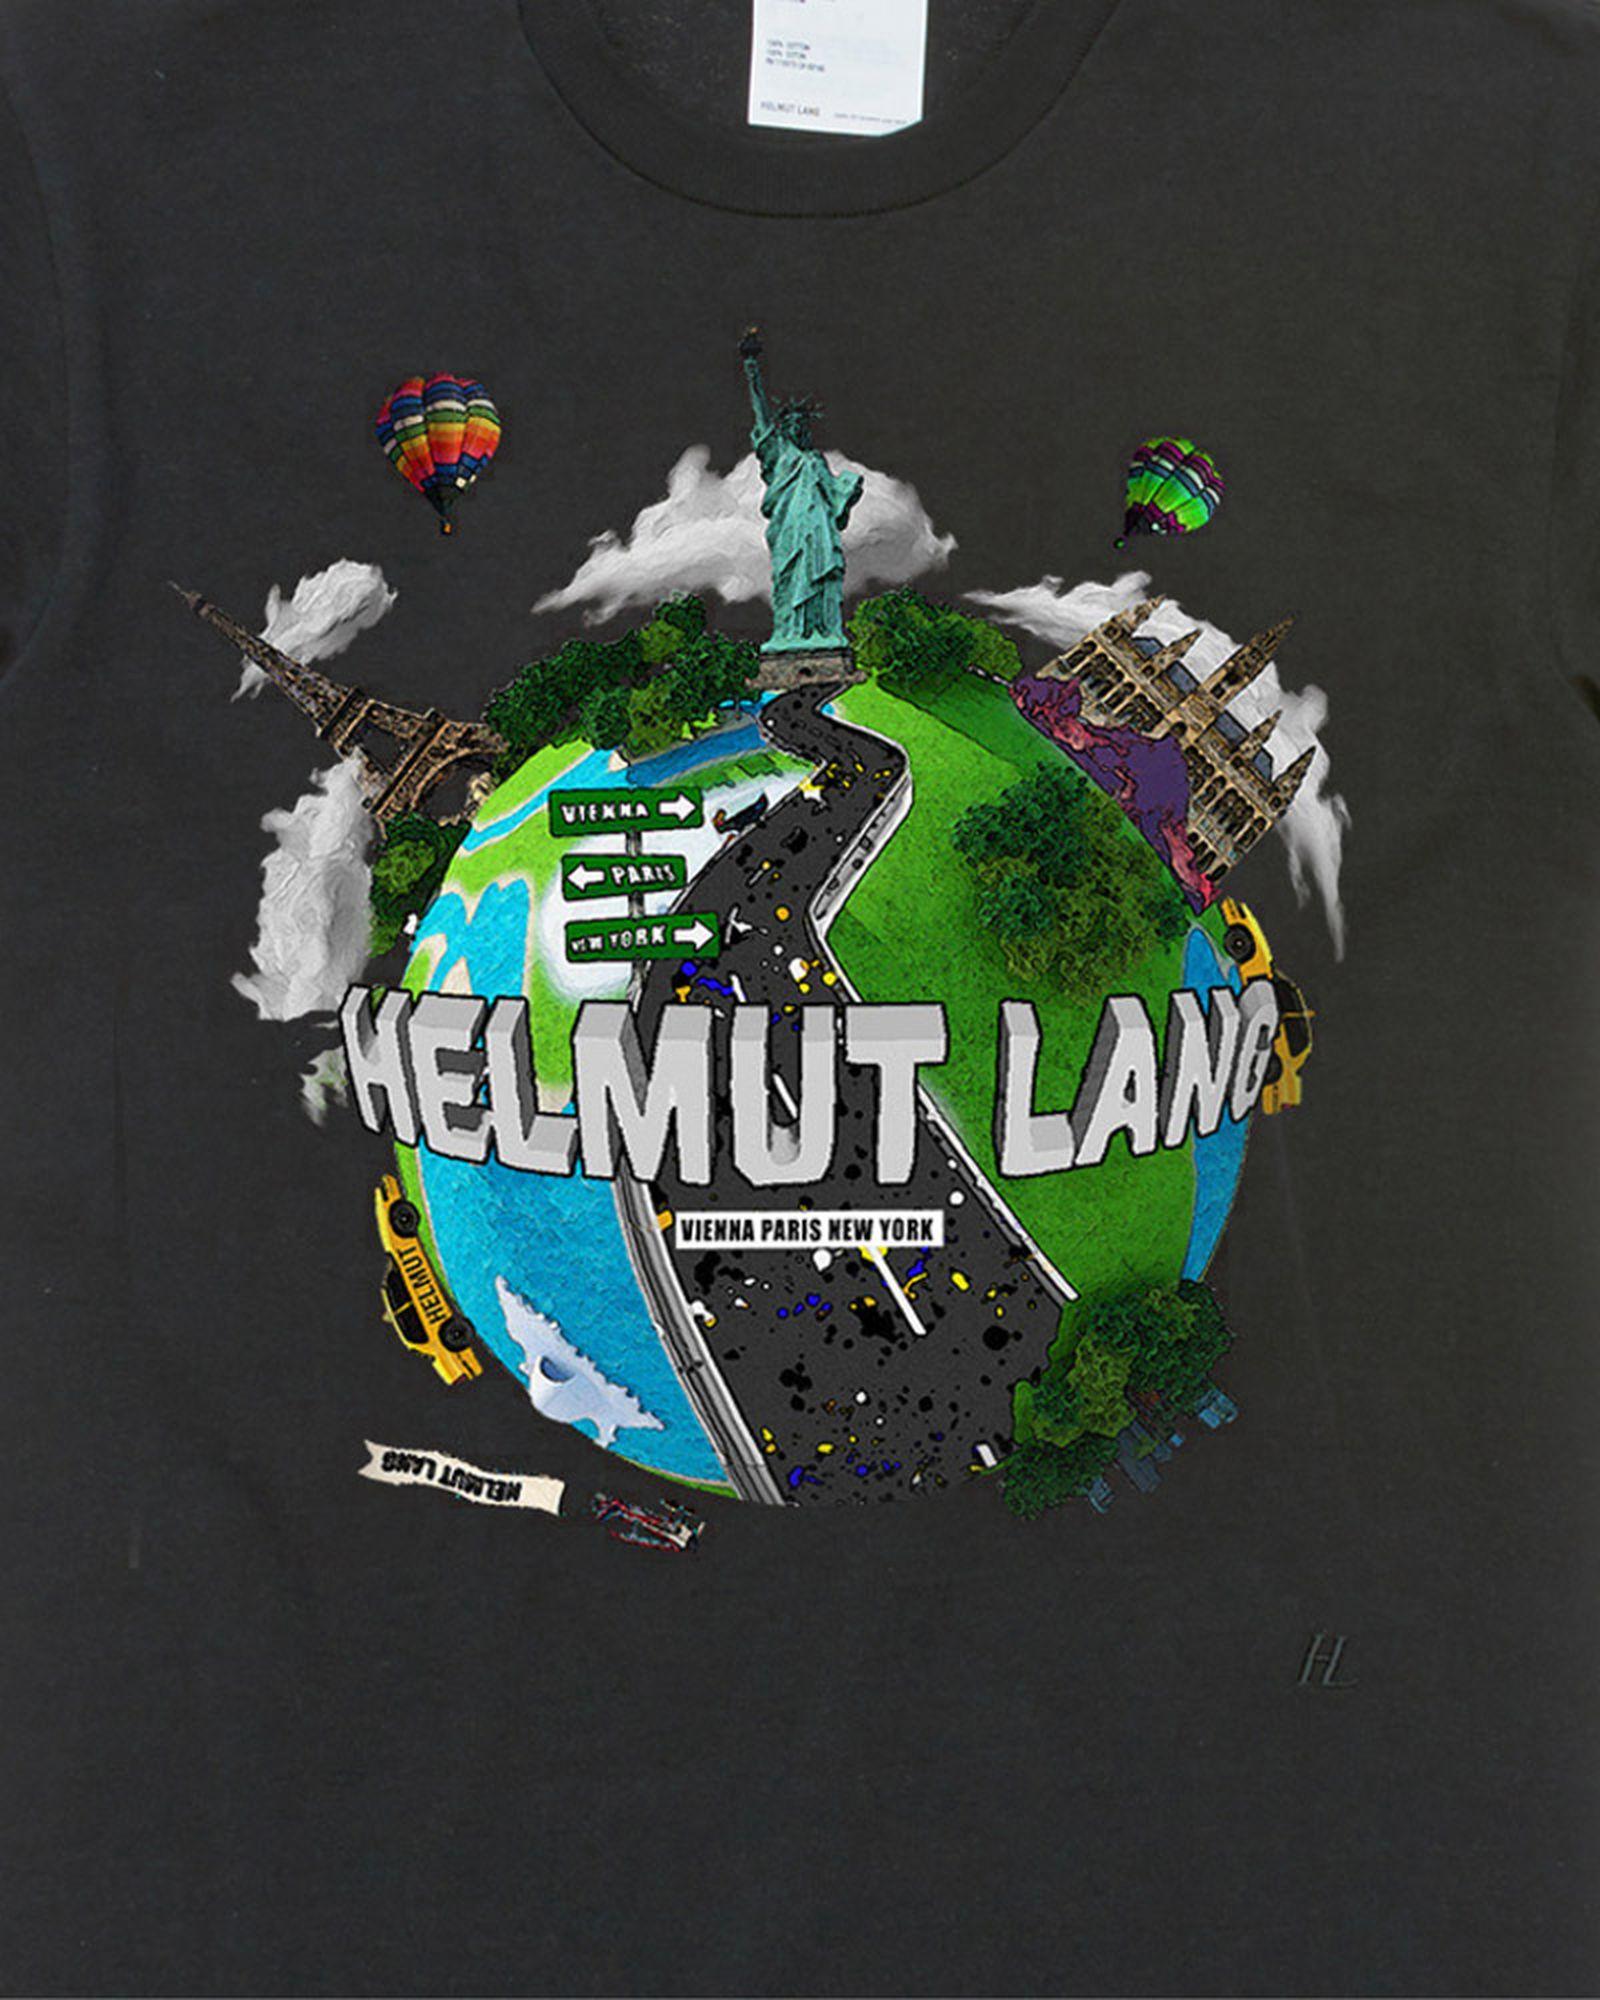 10helmut-lang-t-shirt-design-competition